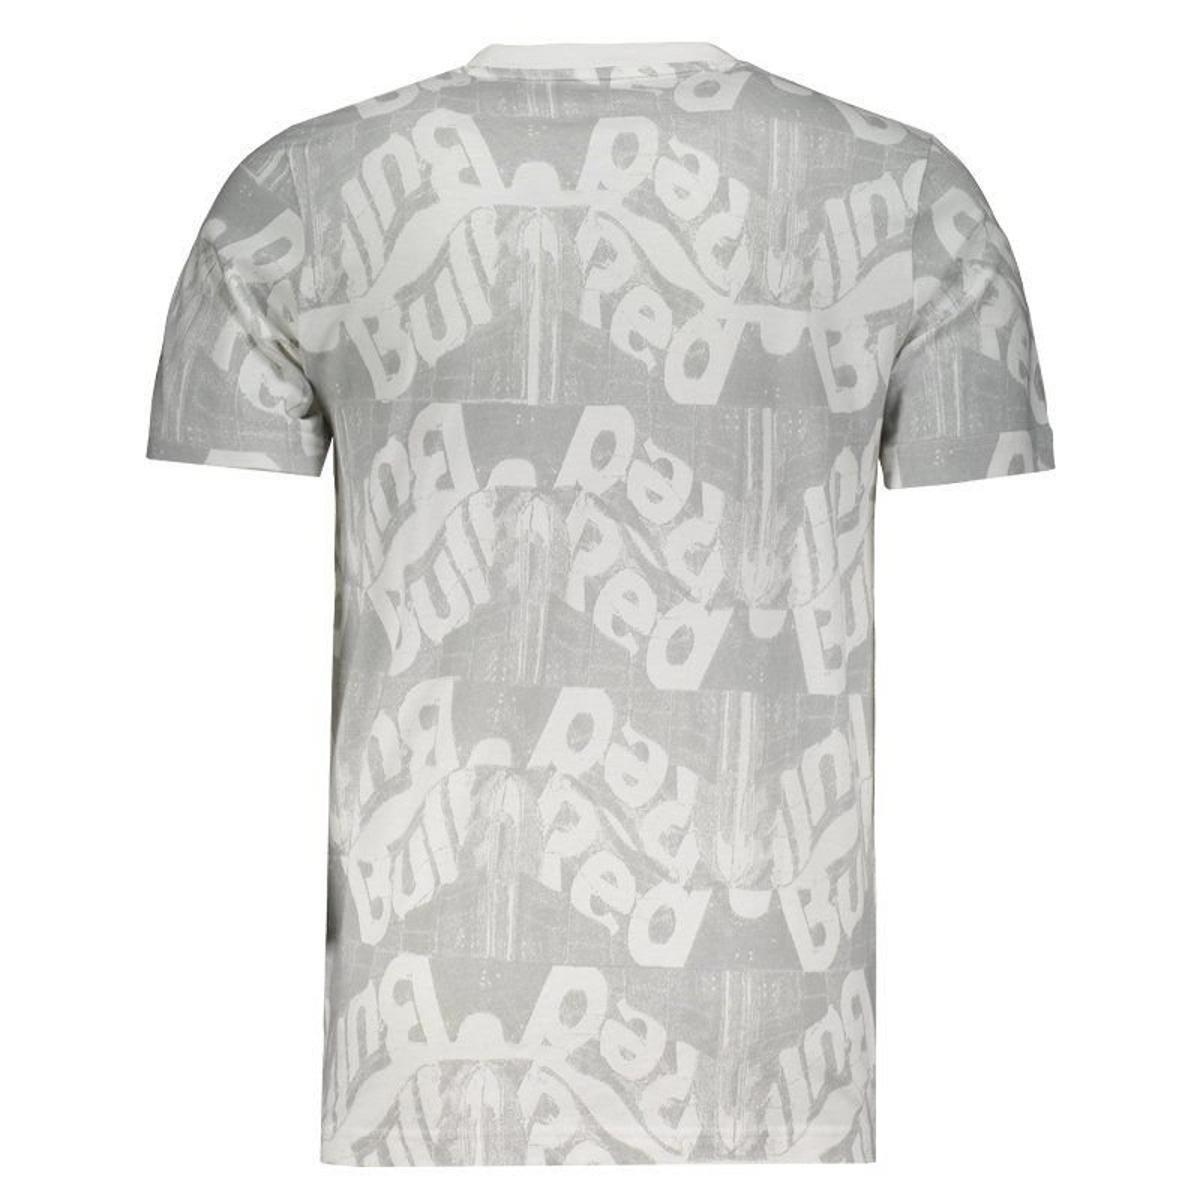 5aaba28df78c6 Camiseta Puma Red Bull Racing AOP Masculina - Branco - Compre Agora ...